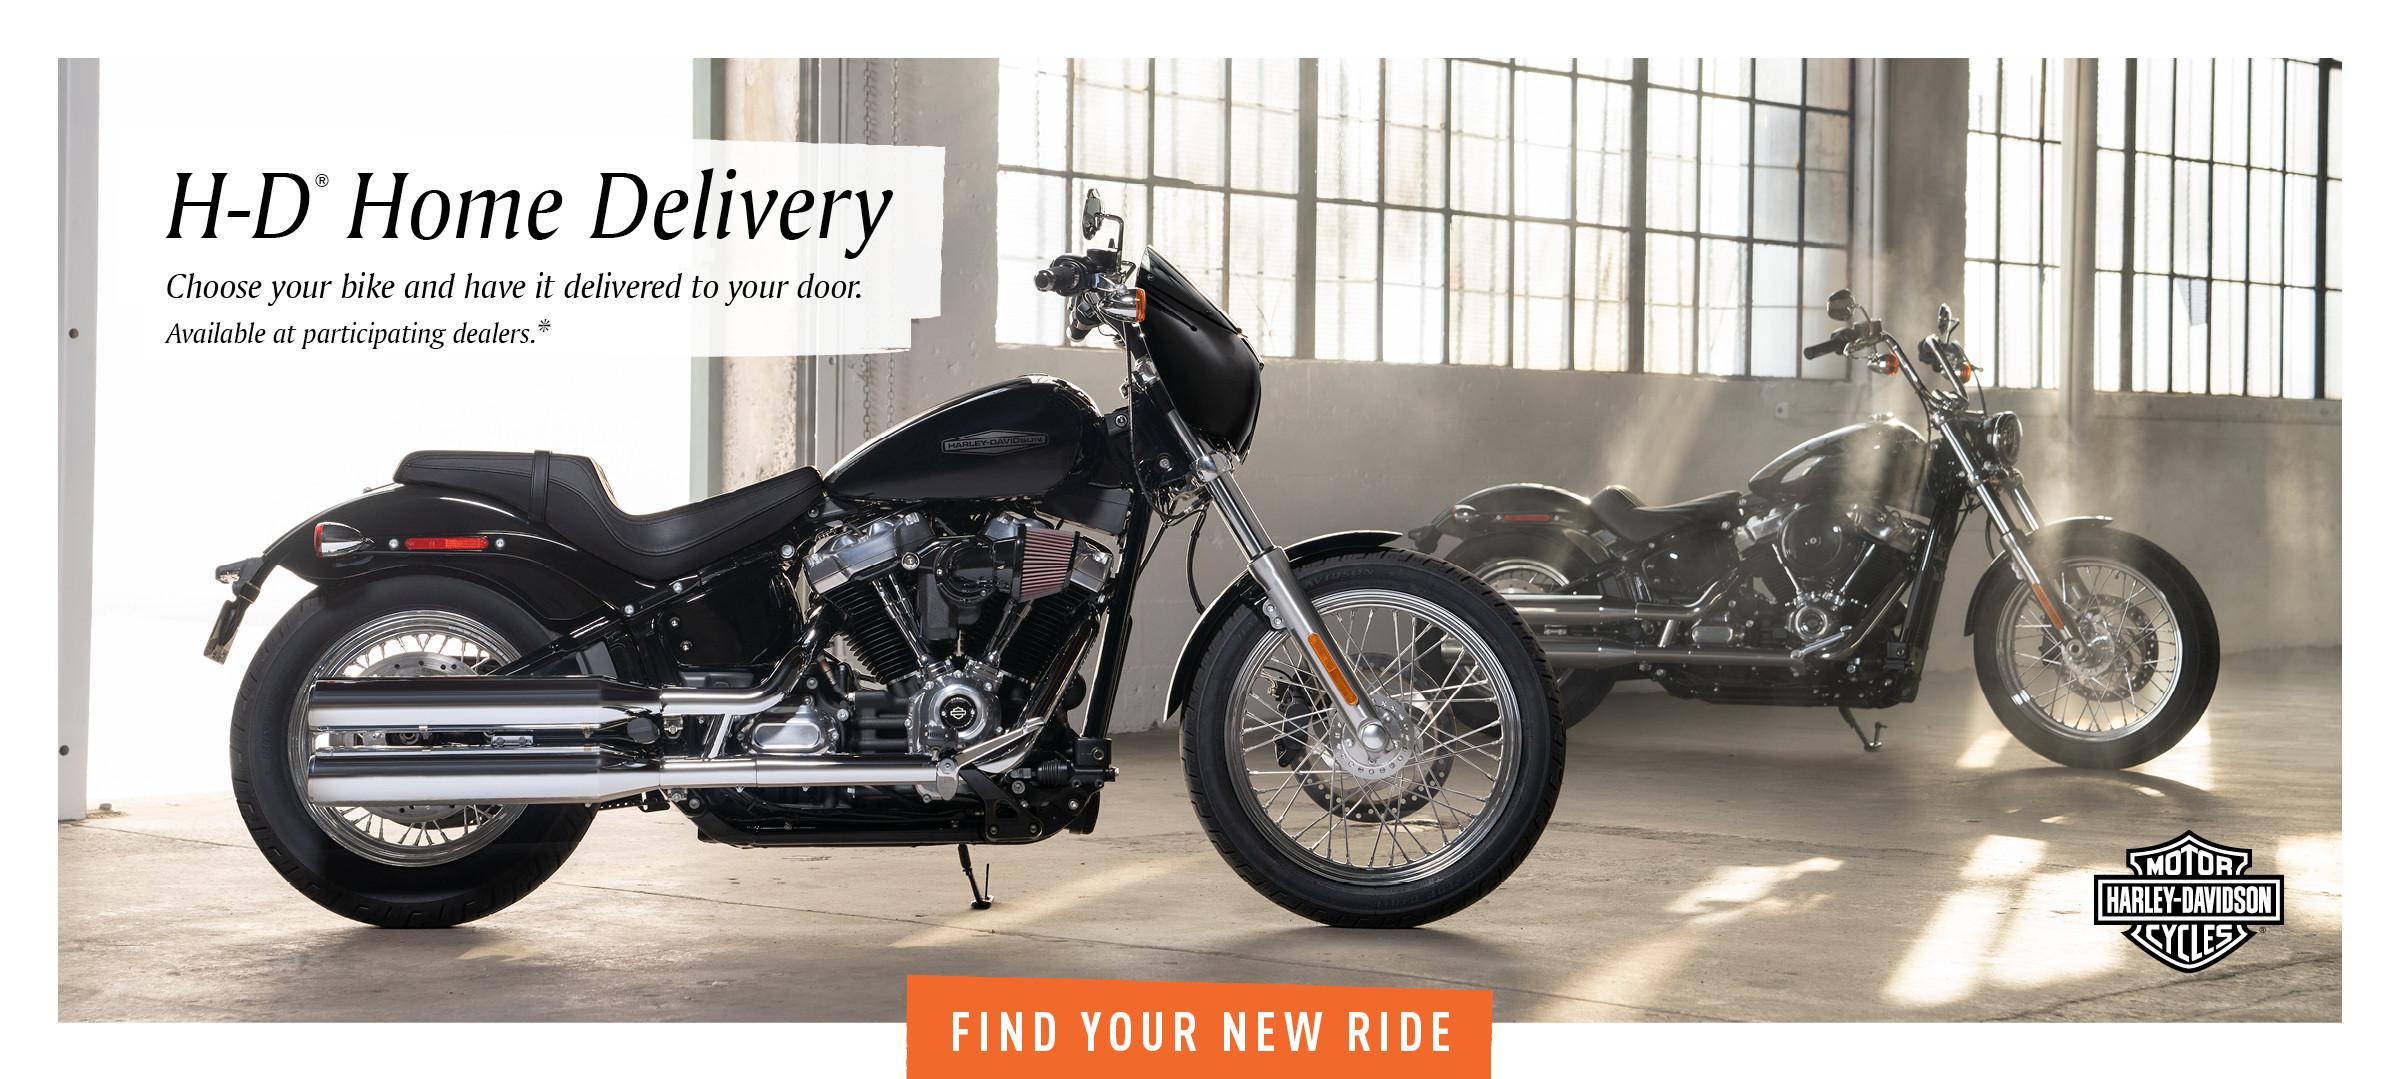 Harley Davidson Motorcycle Dealership In Miami Fl Peterson S Harley Davidson Miami Fl